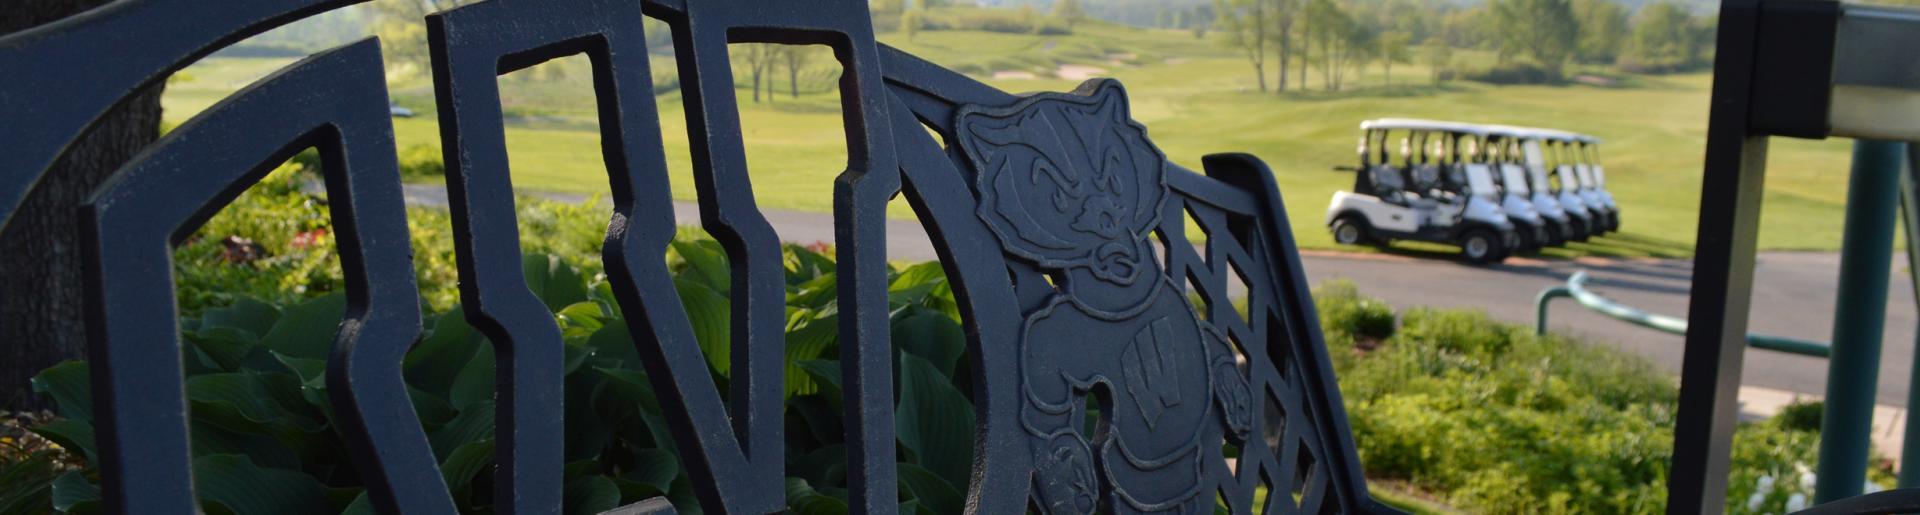 University Ridge Golf Course